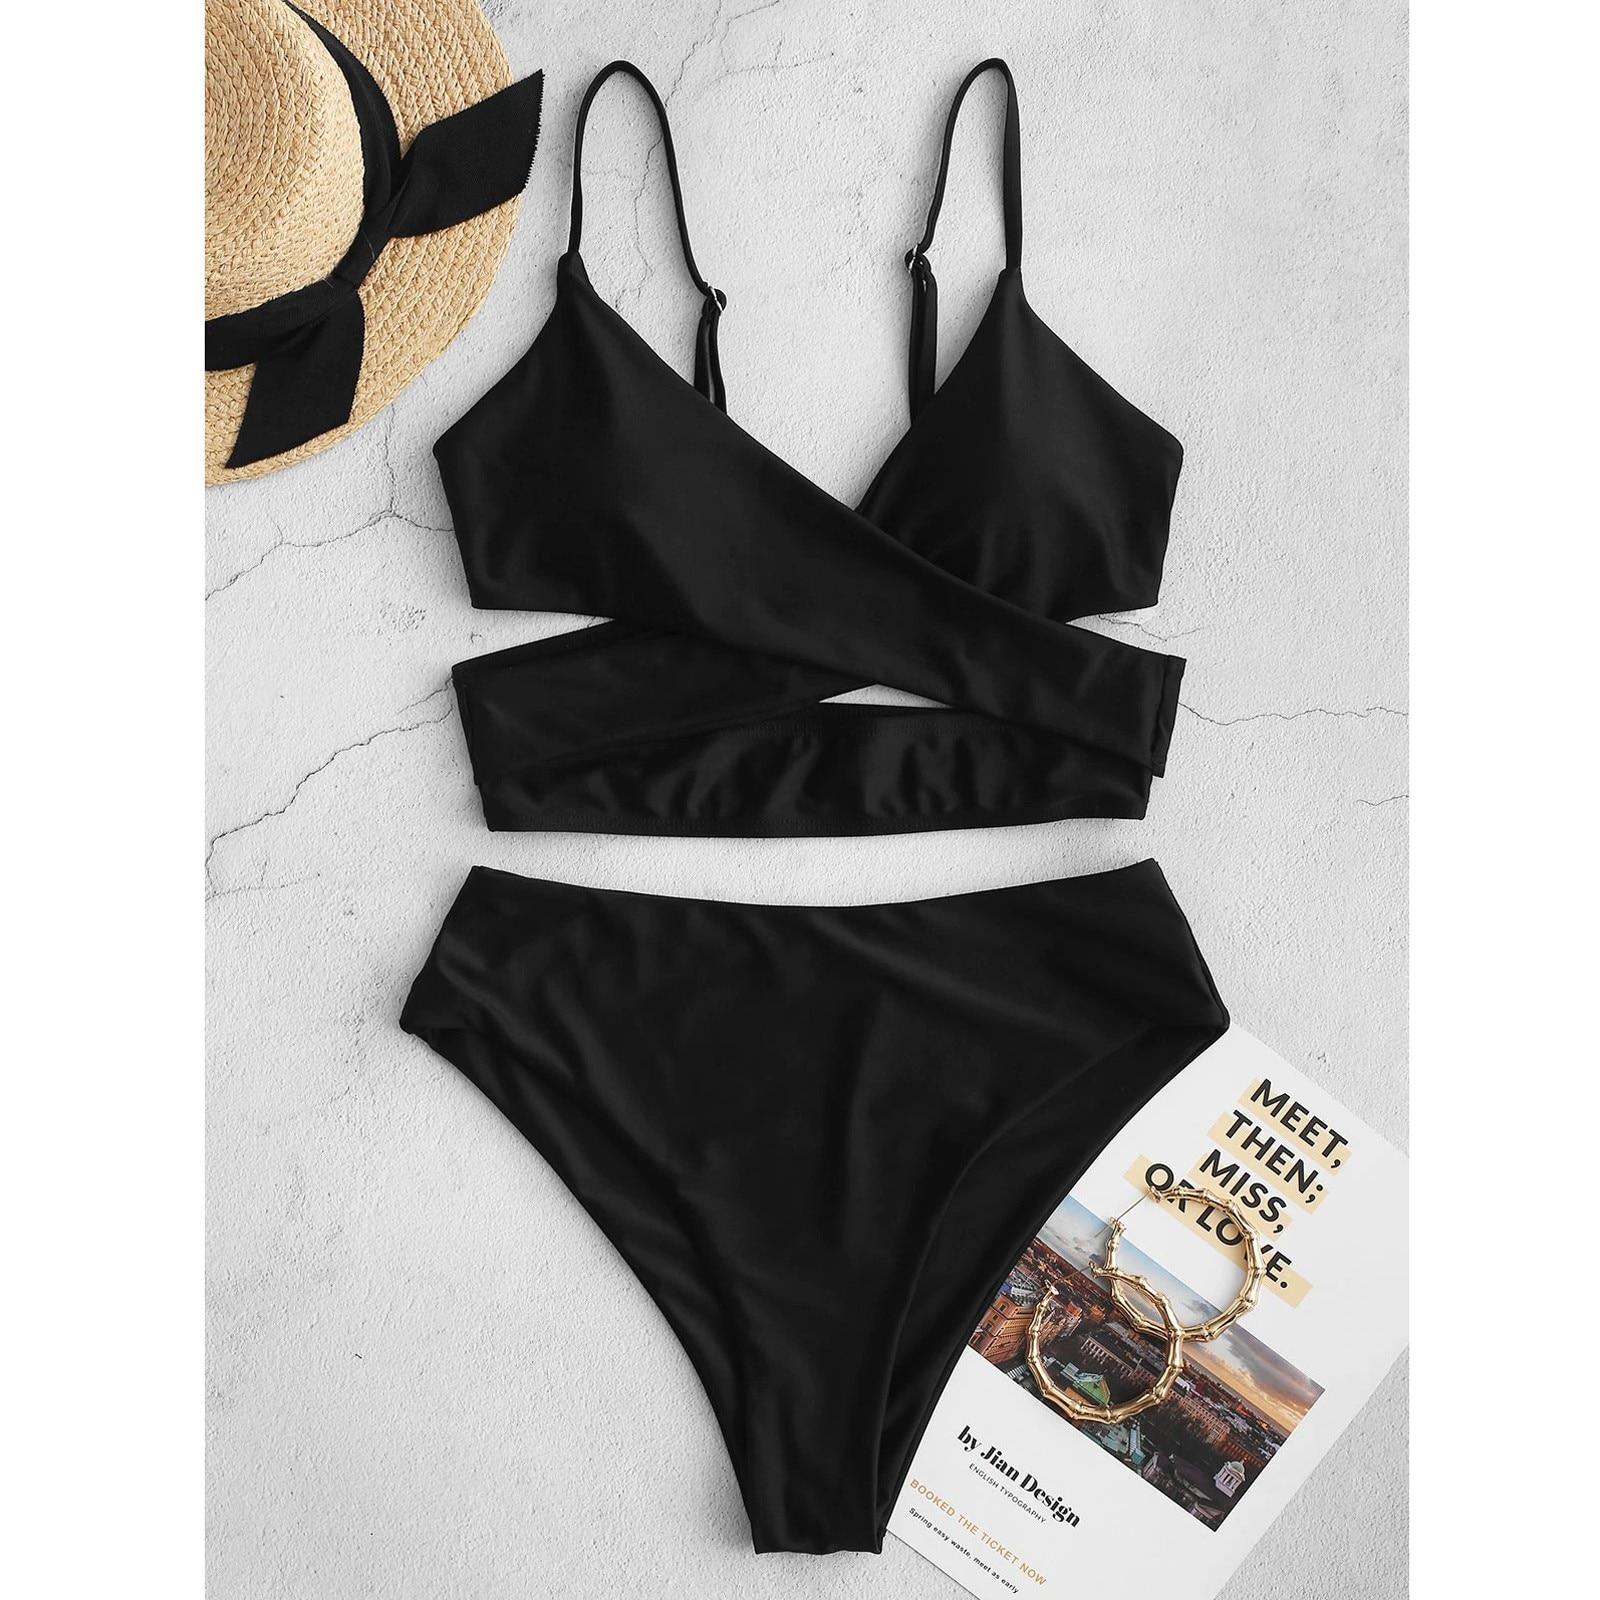 4 # das mulheres Bikini Alta Waisted Tummy Controle Купальники Cor Sólida Swimsuit Swimwear Tankini Maiô Trajes de Banho Do Vintage